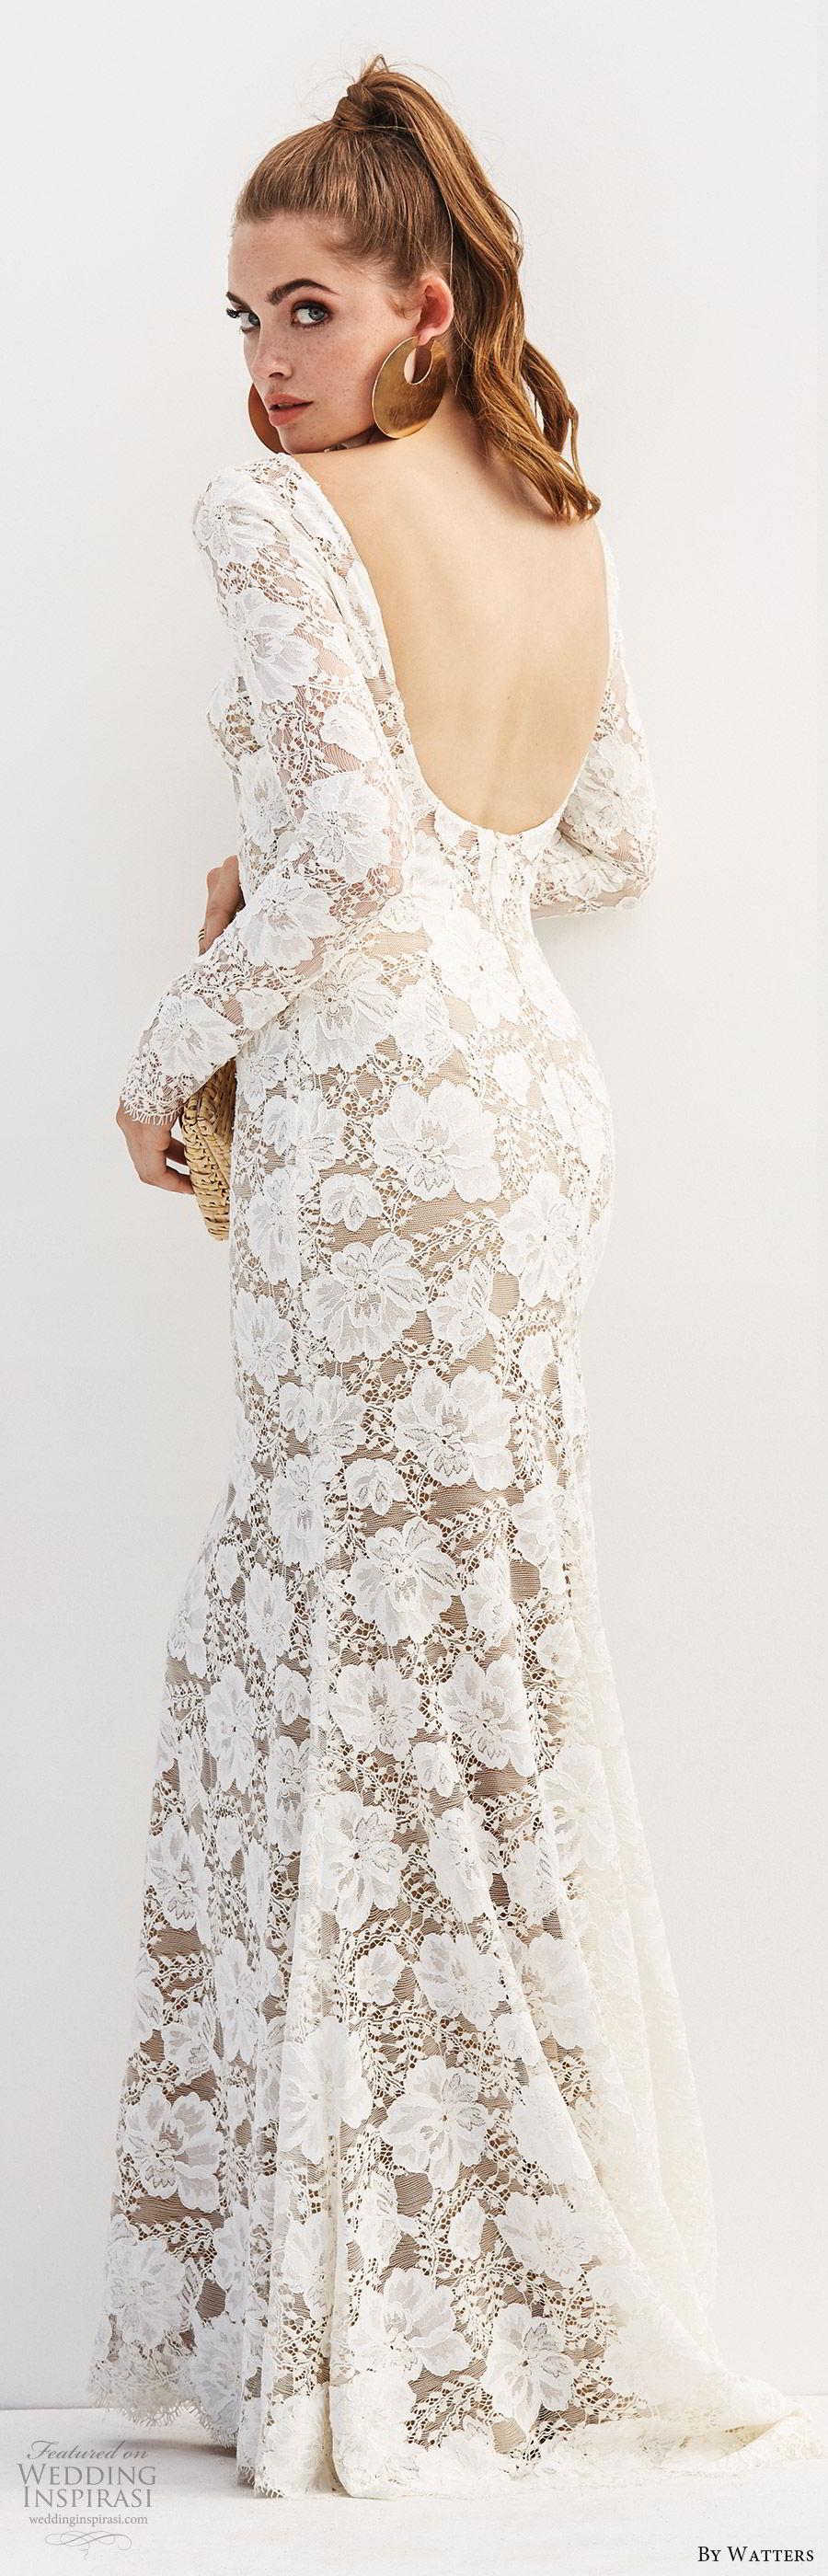 by watters 2020 bridal long sleeve bateau lace sheath wedding dress (1) open scoop back sweep train elegant chic bv